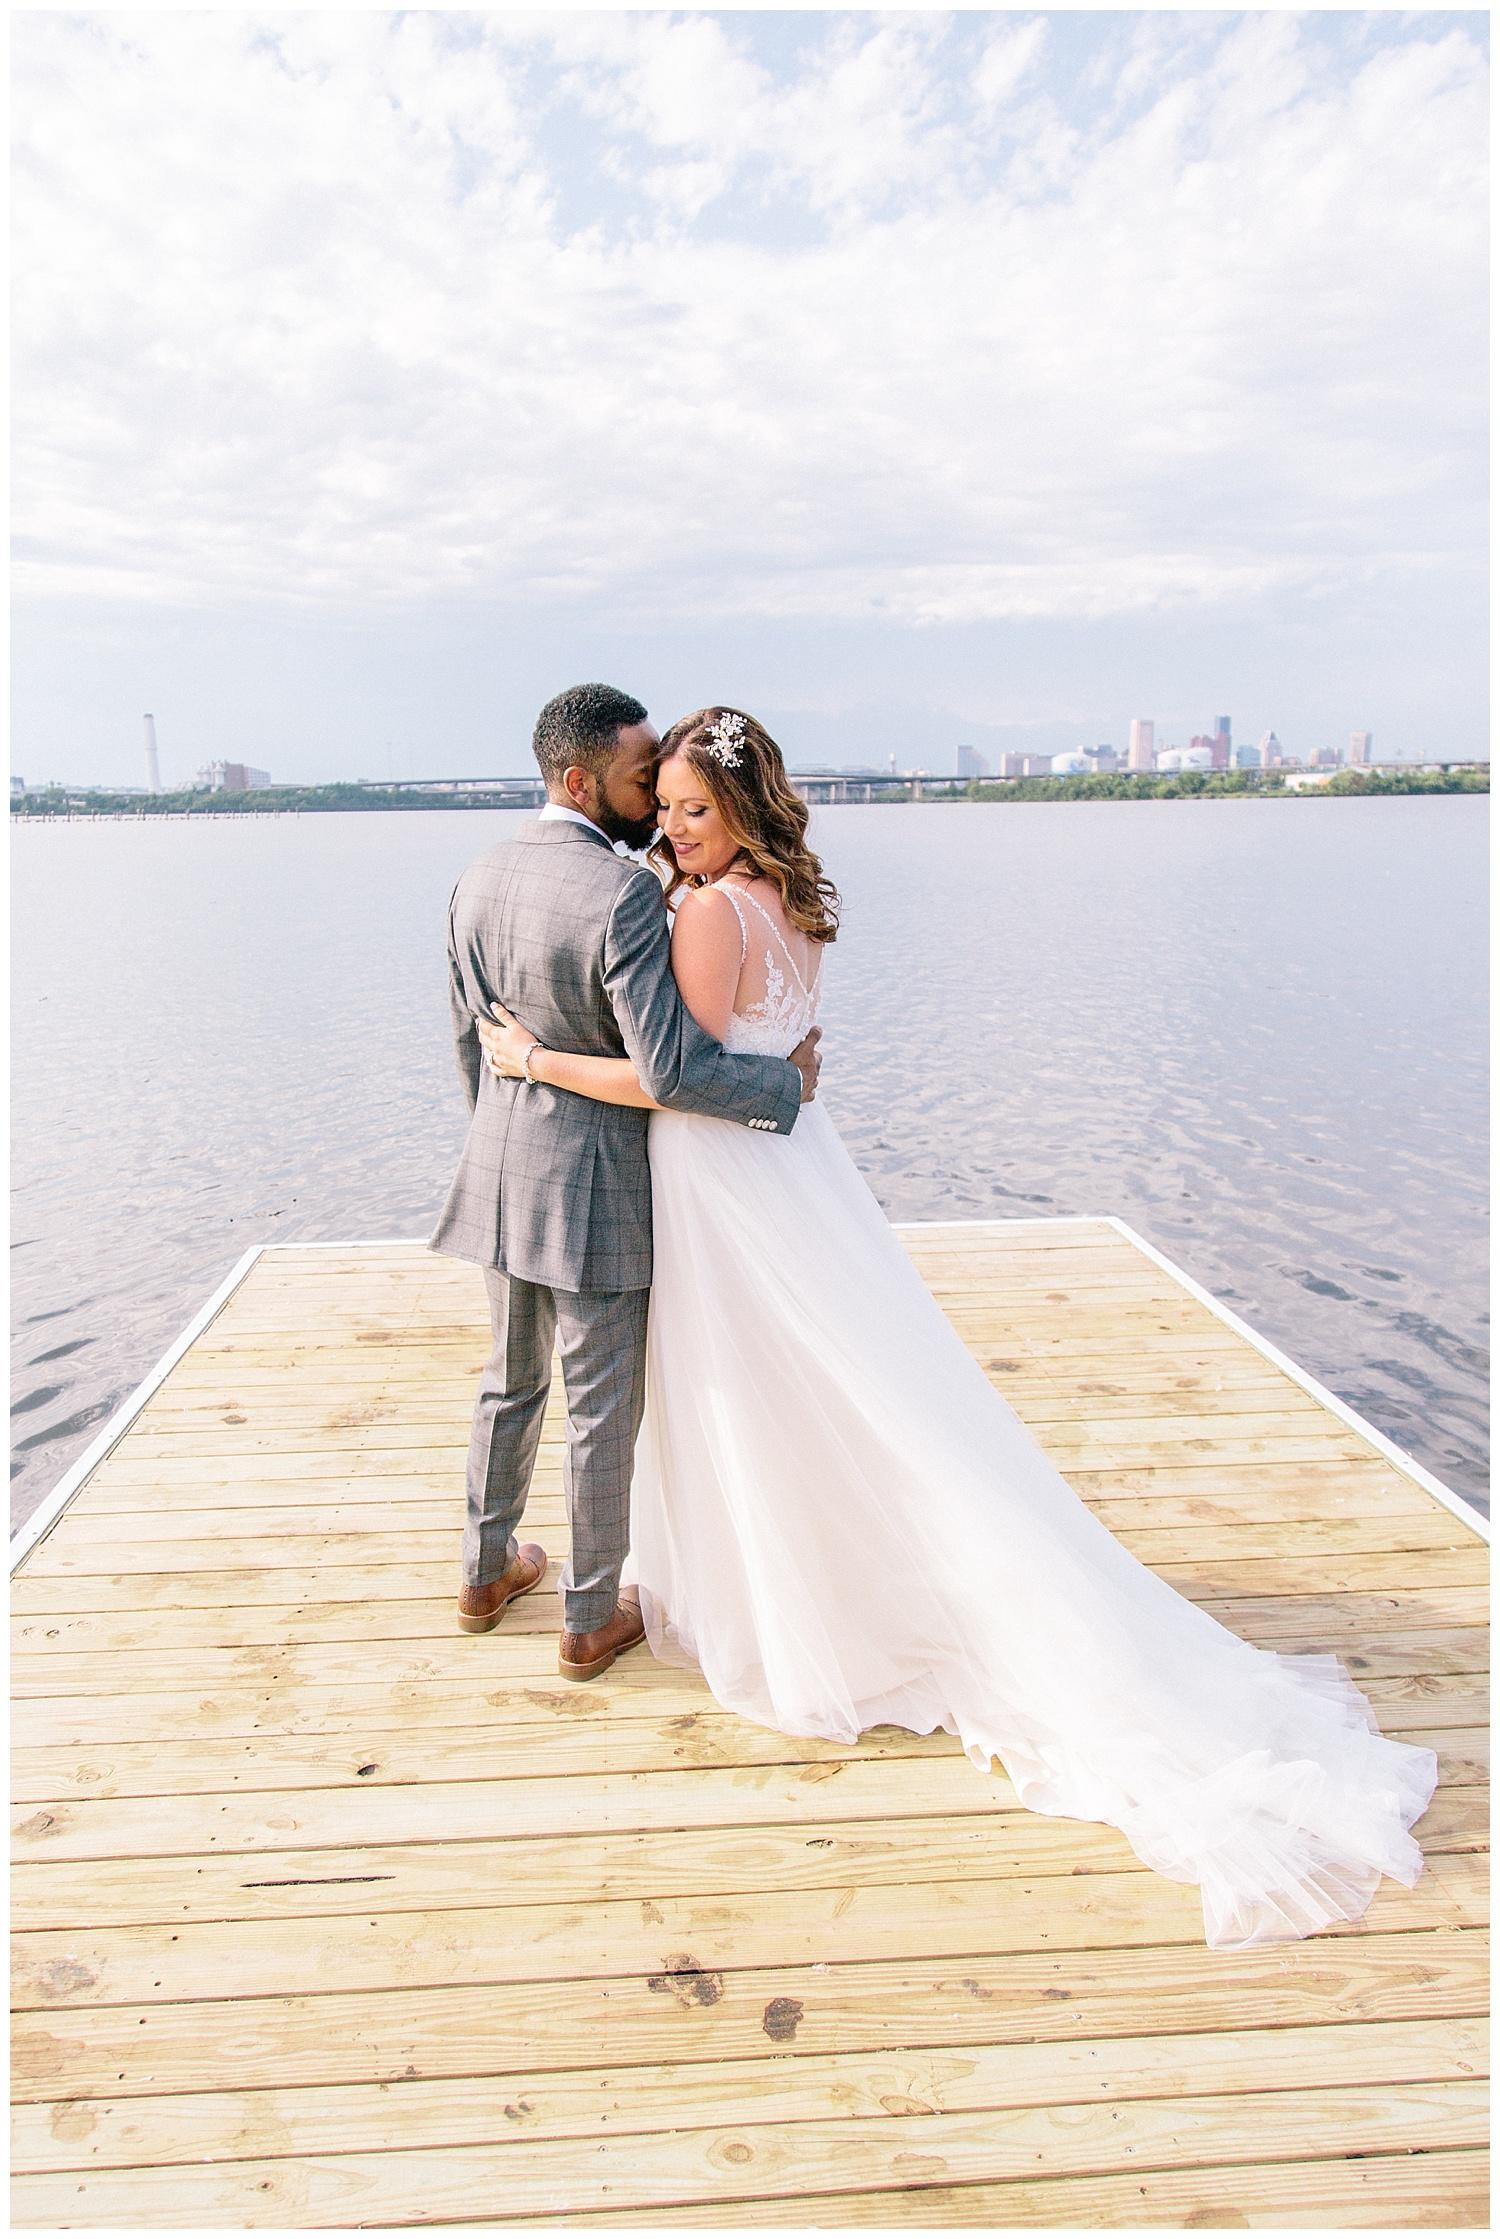 emily-belson-photography-baltimore-rowing-club-wedding-001.jpg